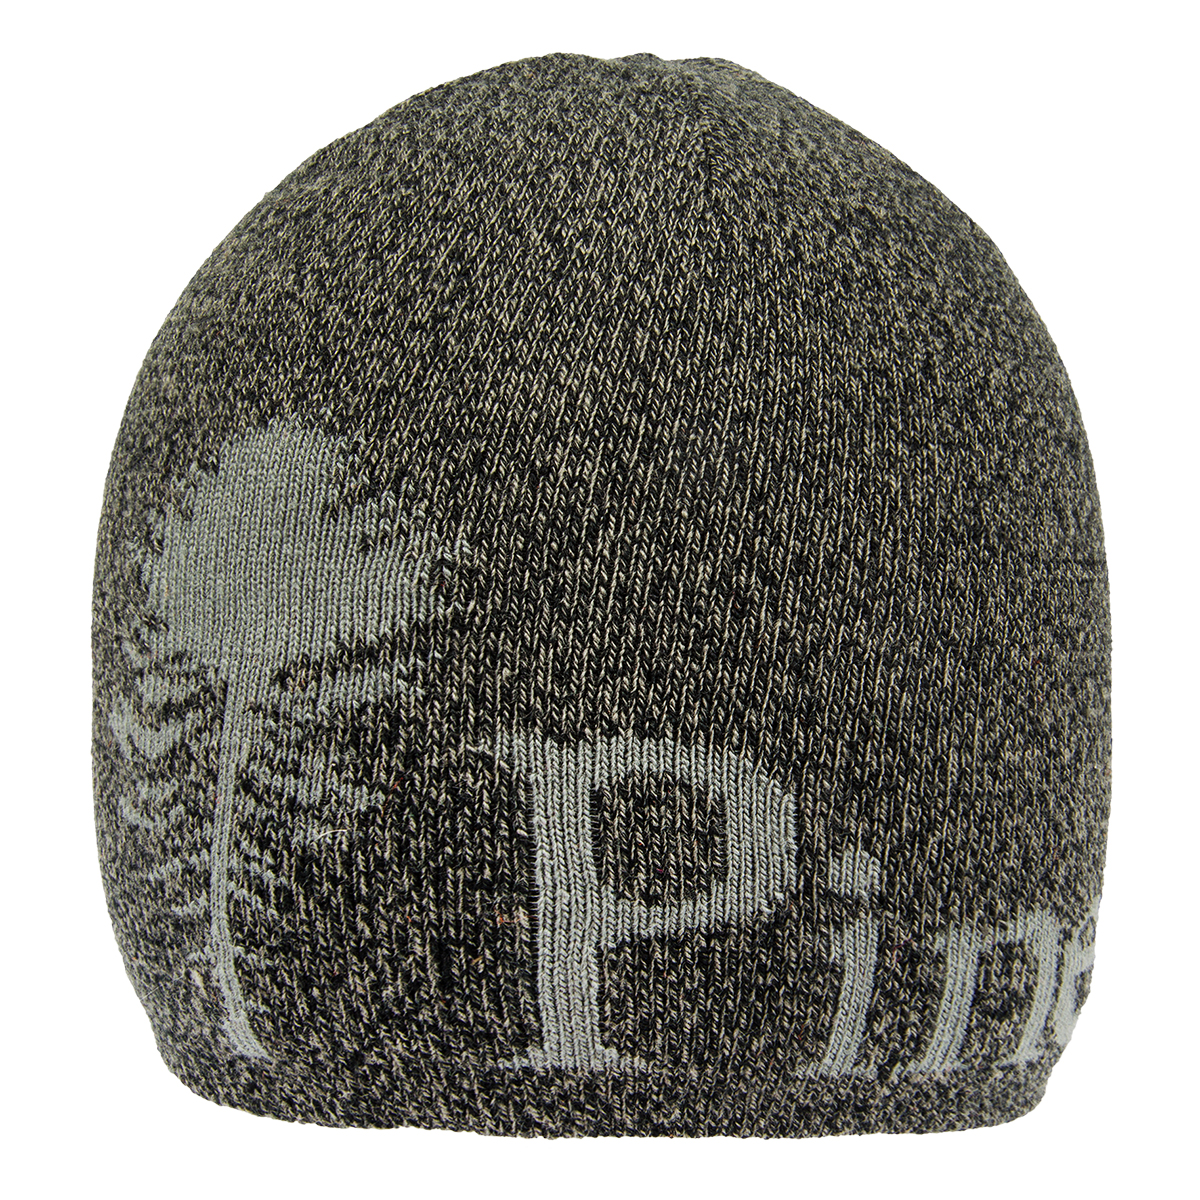 83400e0b3e21 Pinewood Mütze meliert Schwarz Grau im Pareyshop